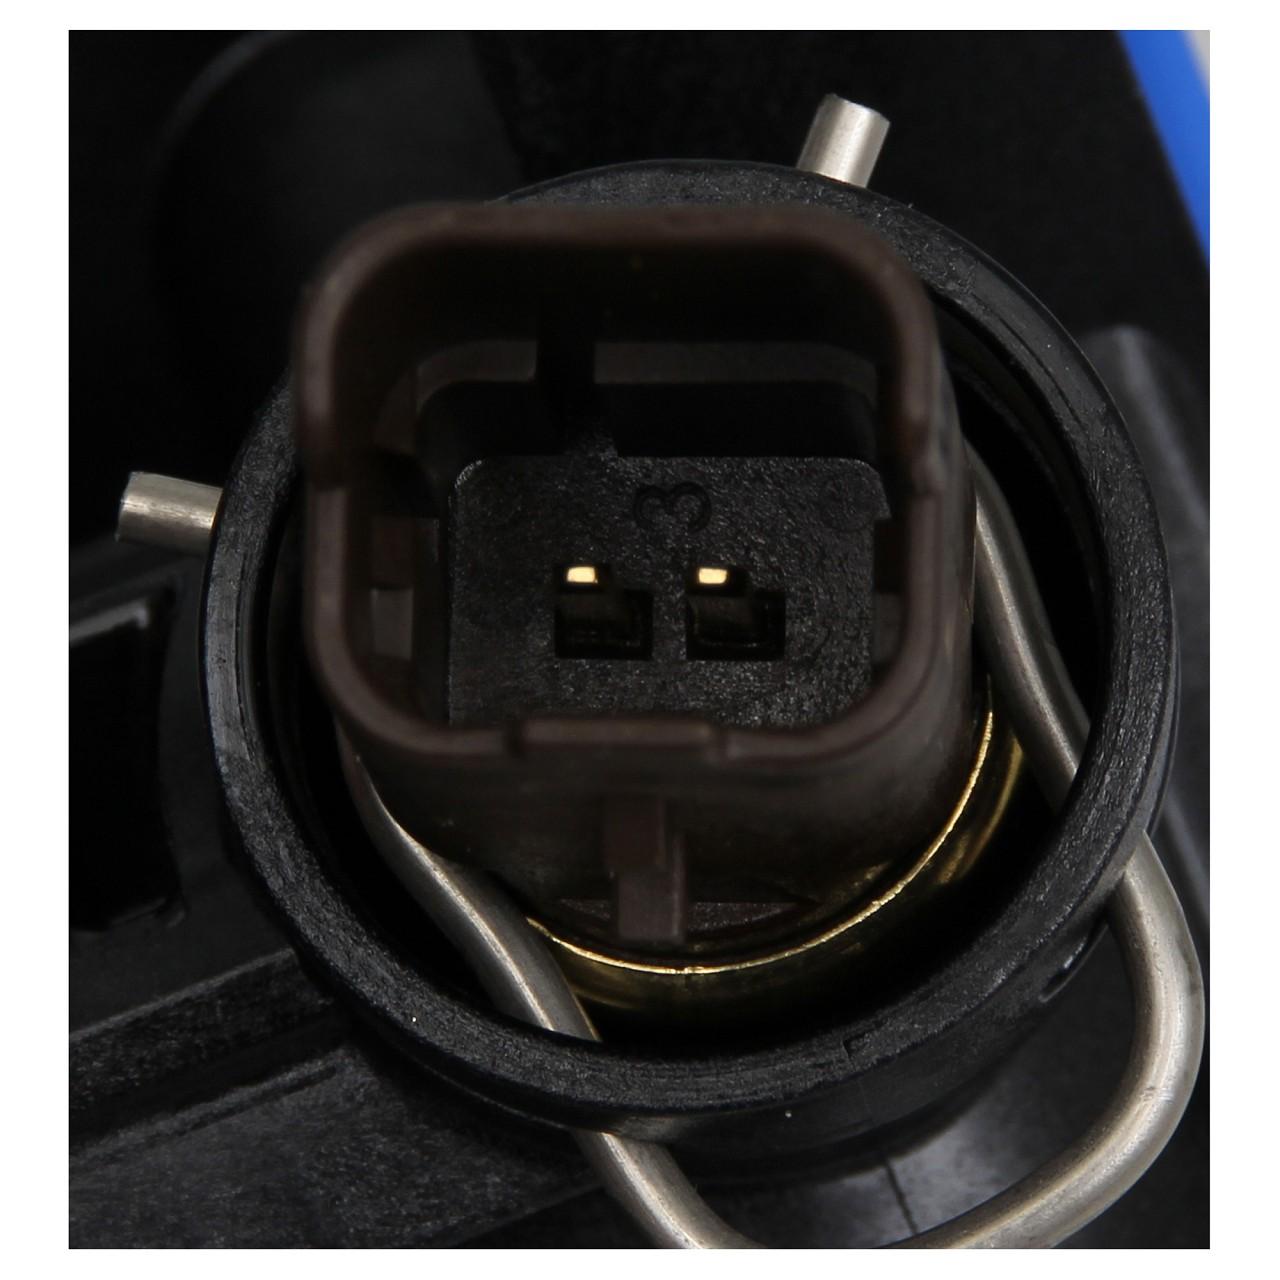 ORIGINAL Citroen Peugeot Thermostatgehäuse + Sensor 9808647080 für 1.6 16V